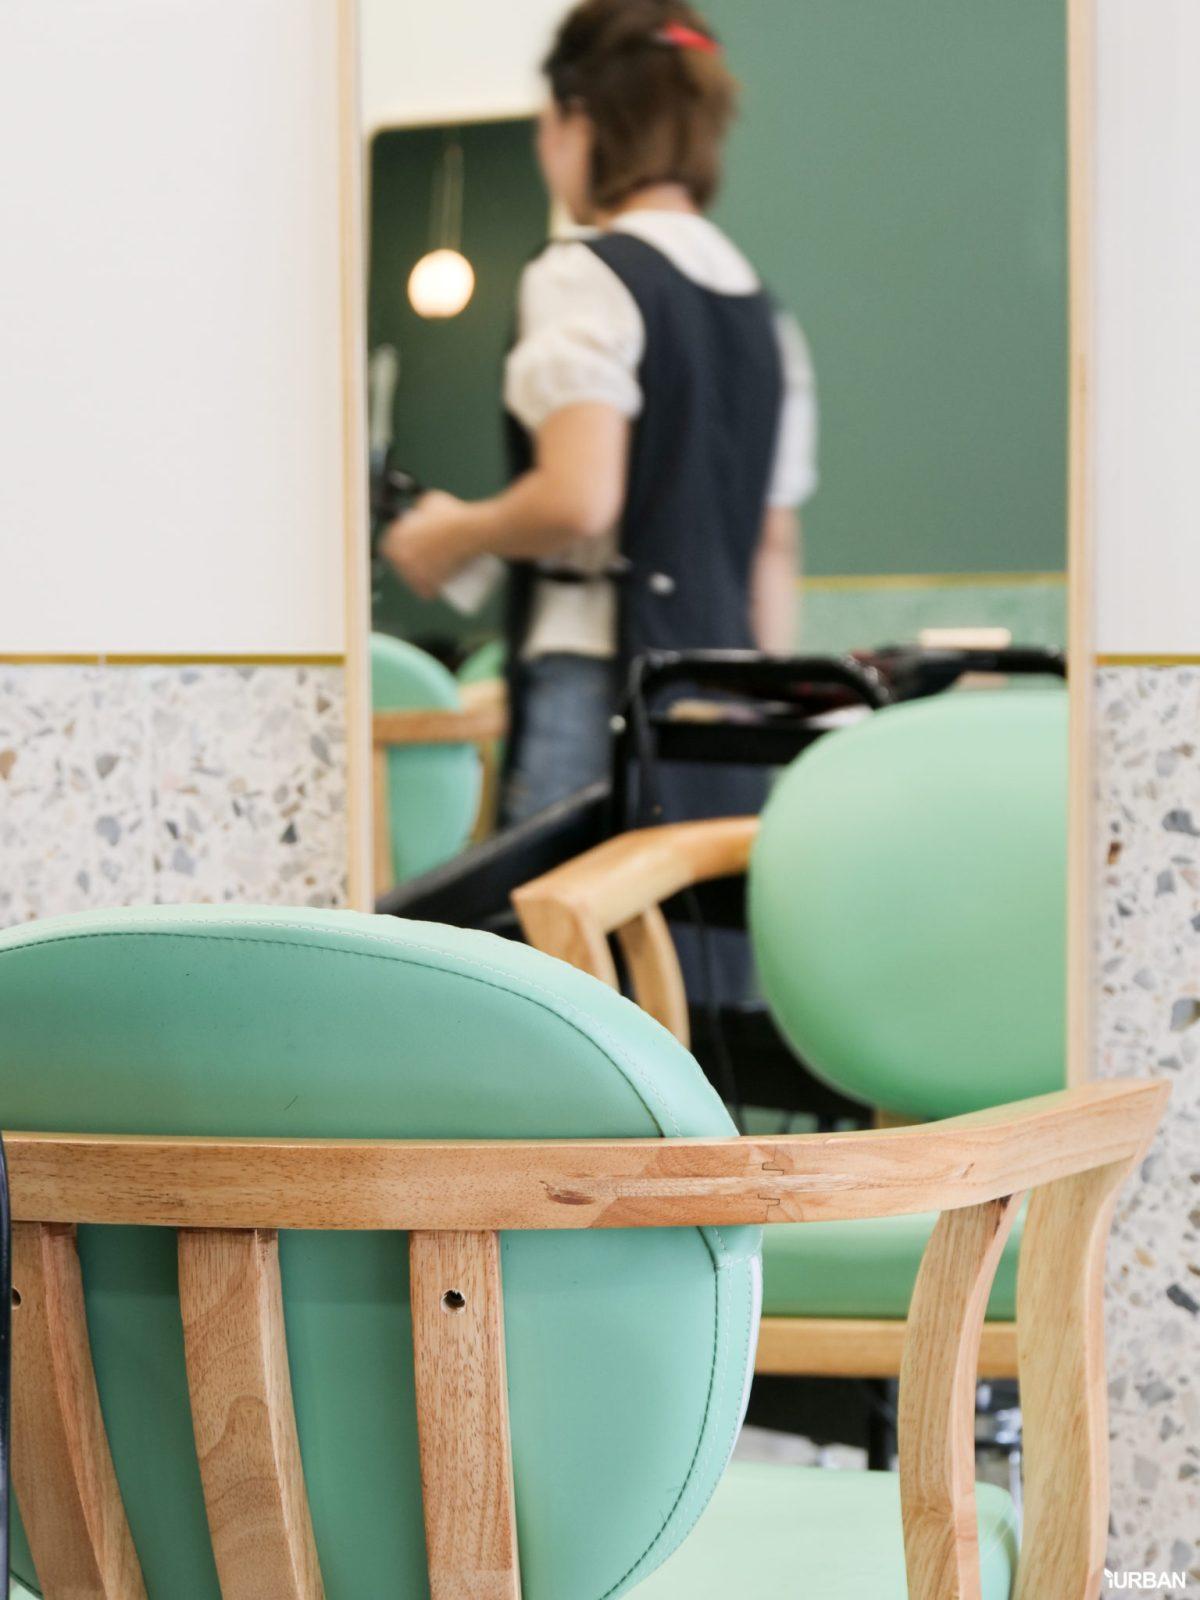 "7 Simply Creative Cafe & Bar ในย่านไลฟ์สไลต์สุดฮิป กับ 24 Hr. Co-Working Space กลาง New Interchange ""รัชดา - ลาดพร้าว"" 73 - cafe"